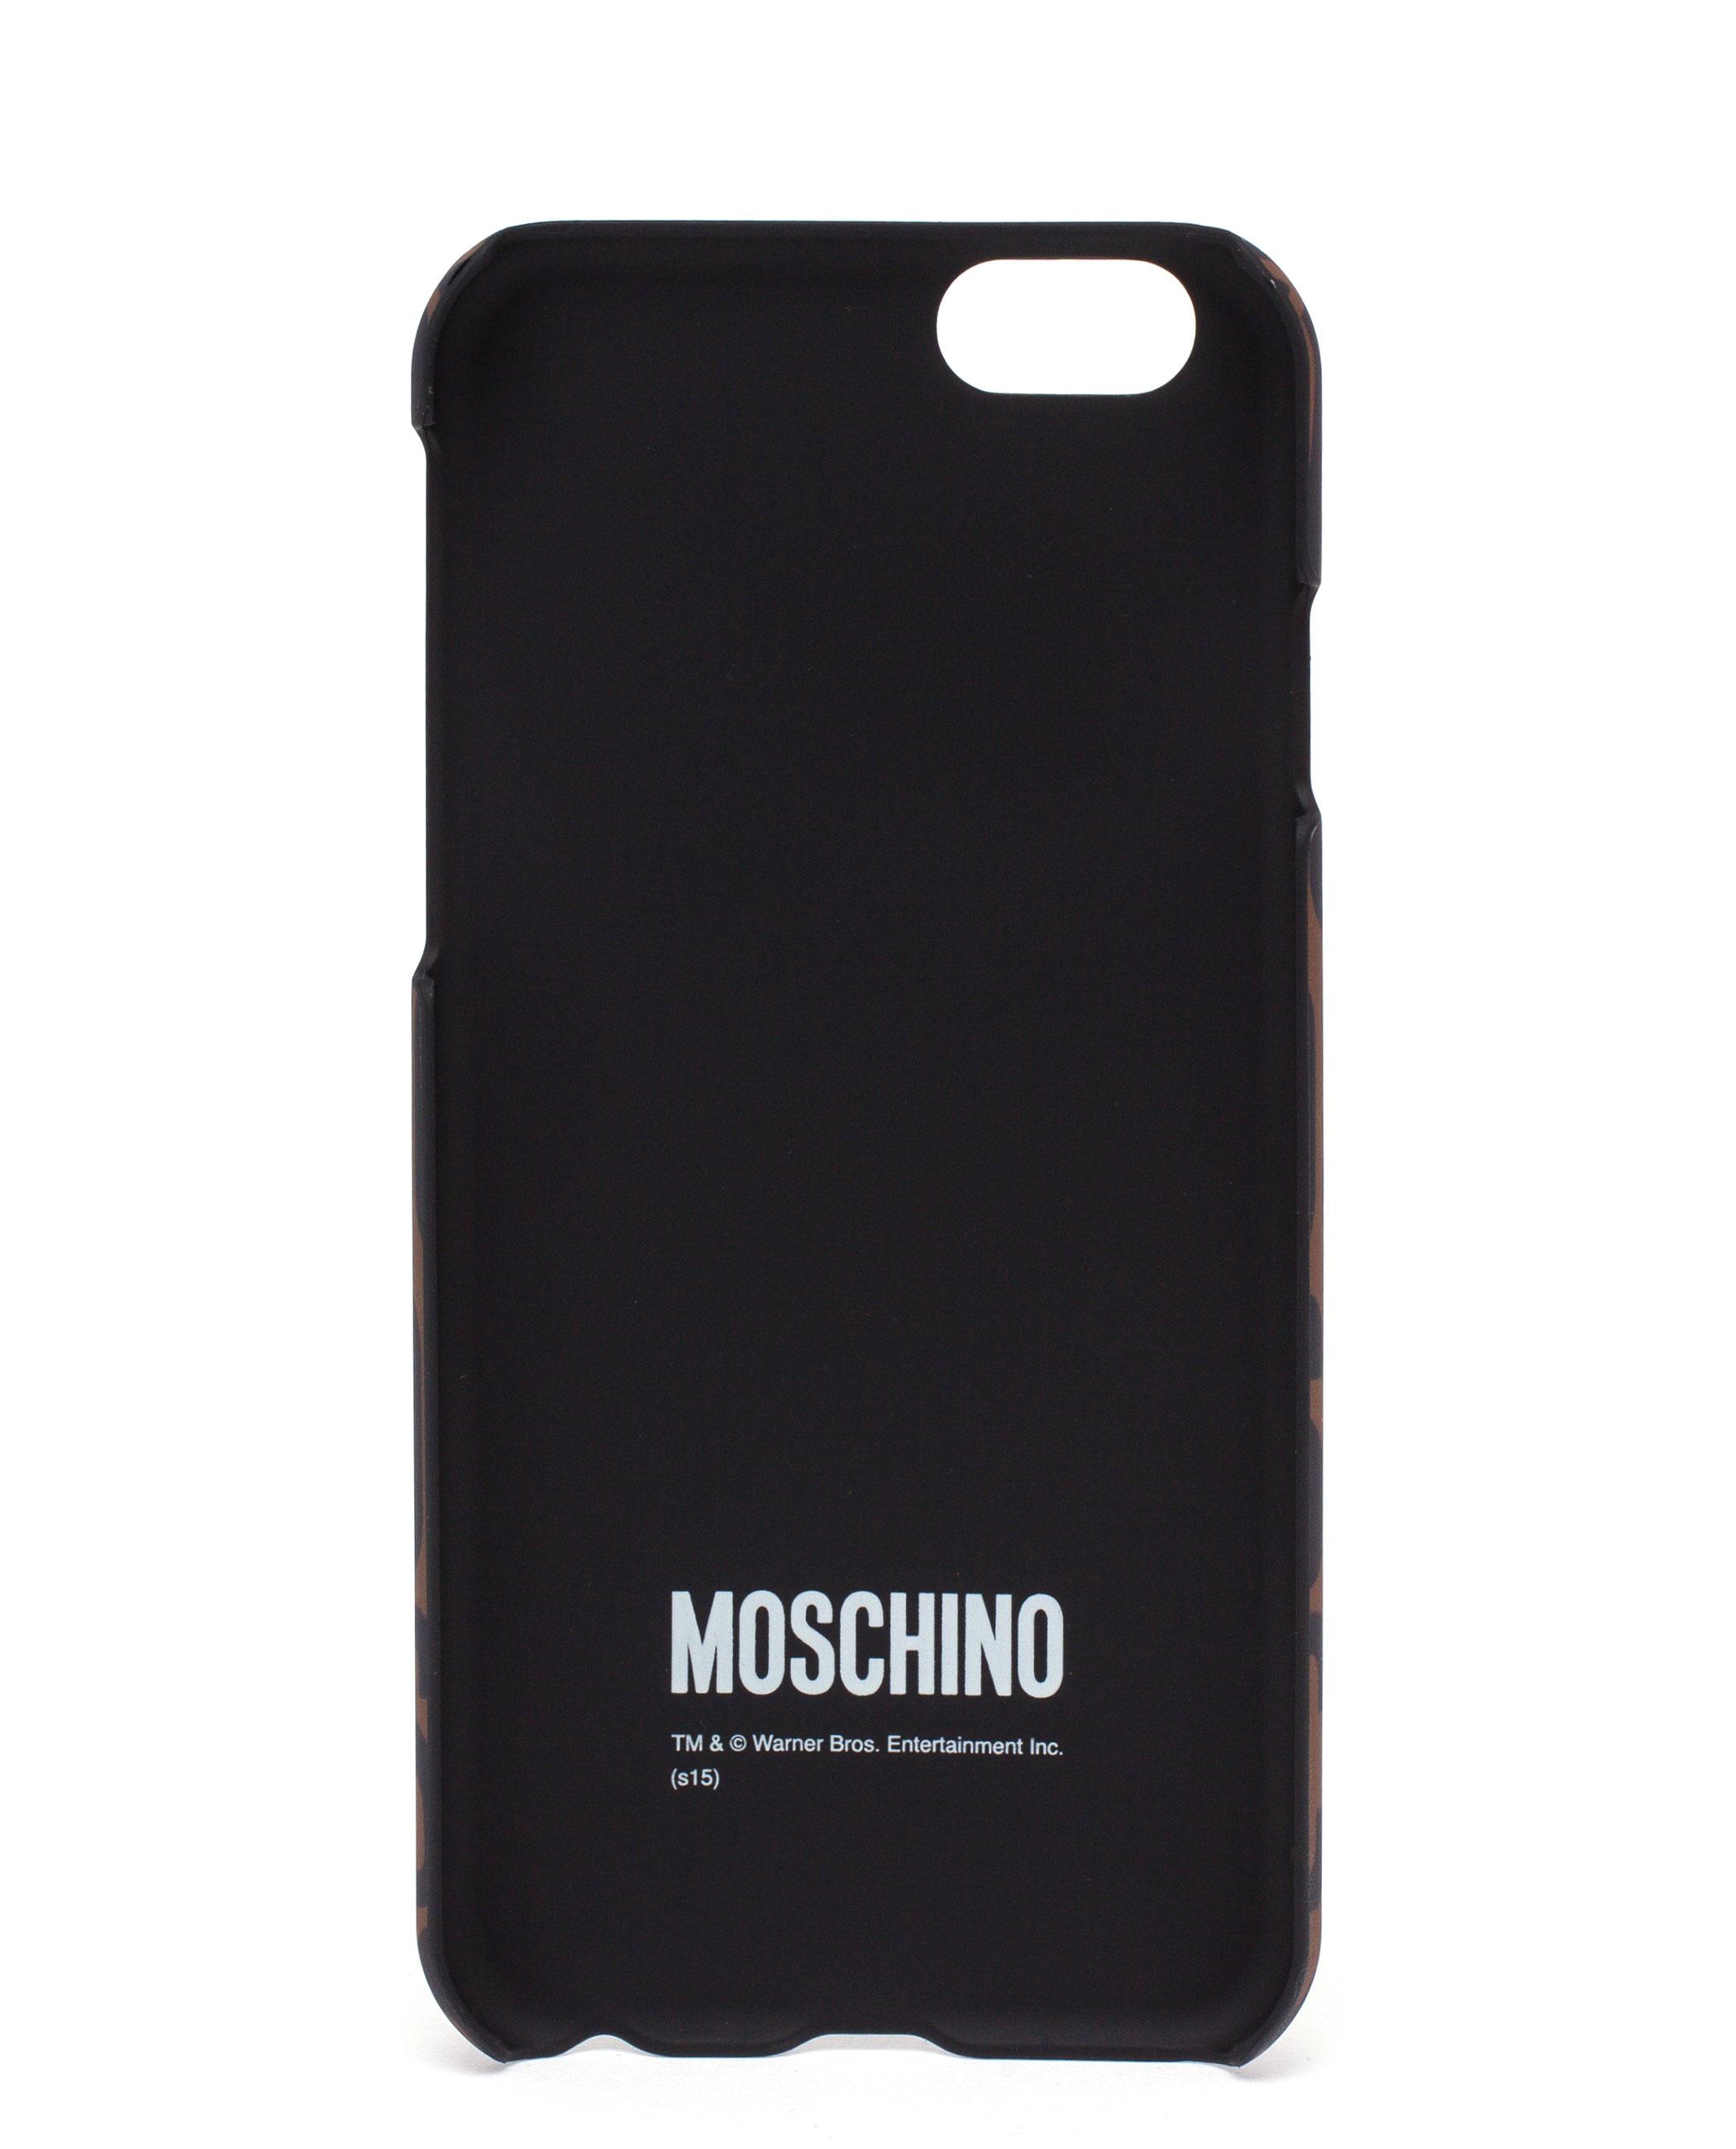 moschino phone case iphone 6